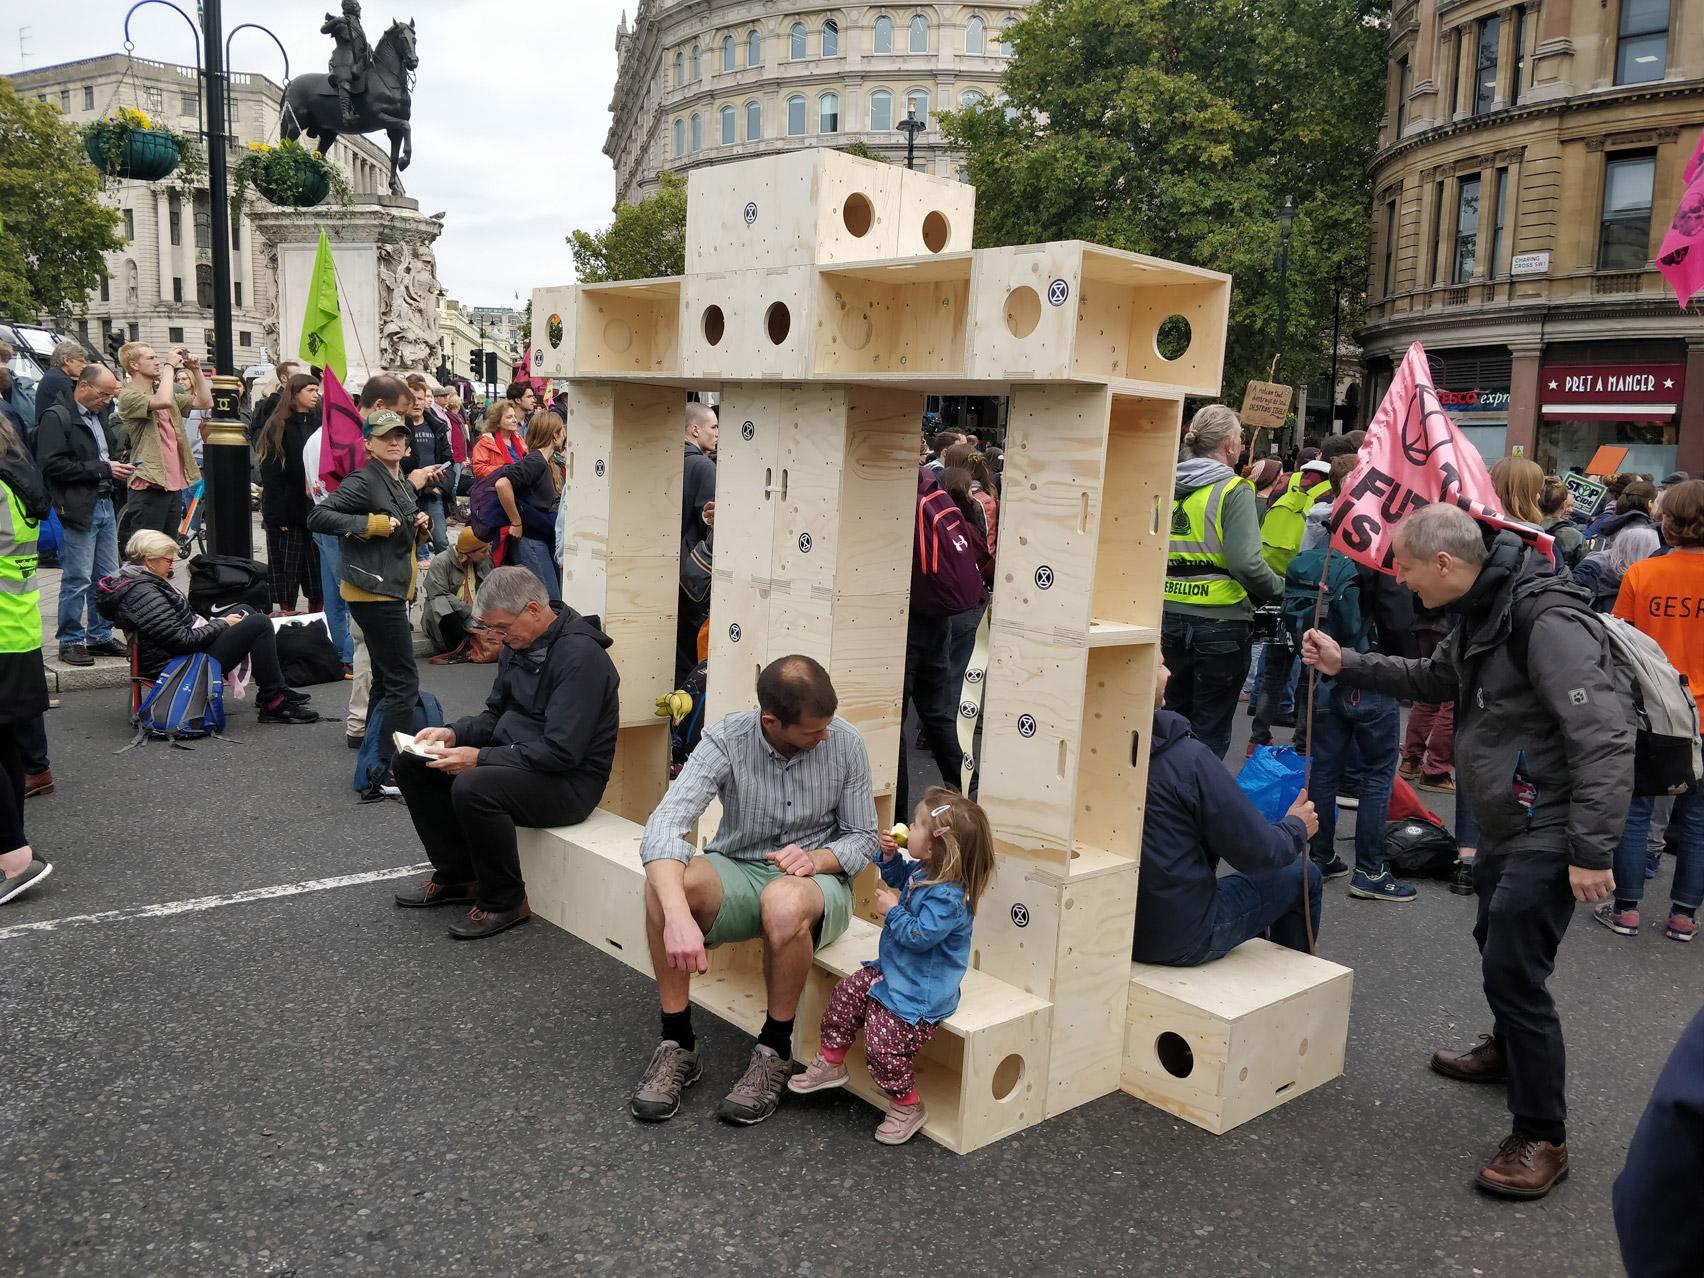 extinction-rebellion-protest-architecture-u-build-modular-boxes-_dezeen_1704_col_0